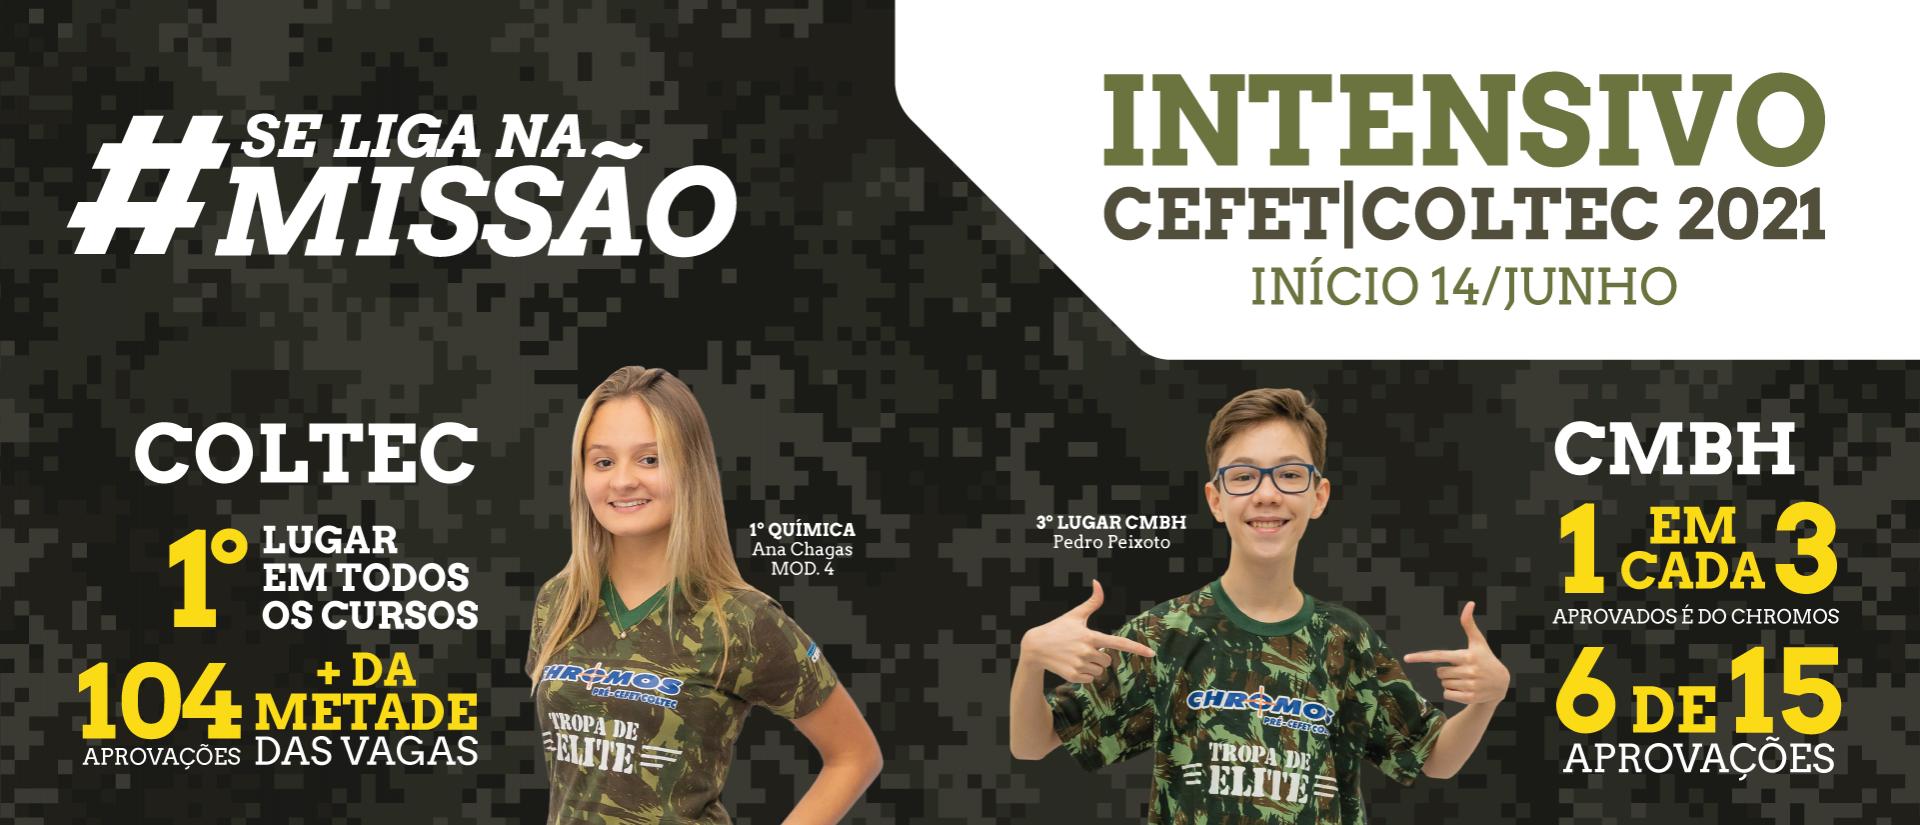 banner rotativo-aprovados-intensivo-cefet-coltec-2021-01